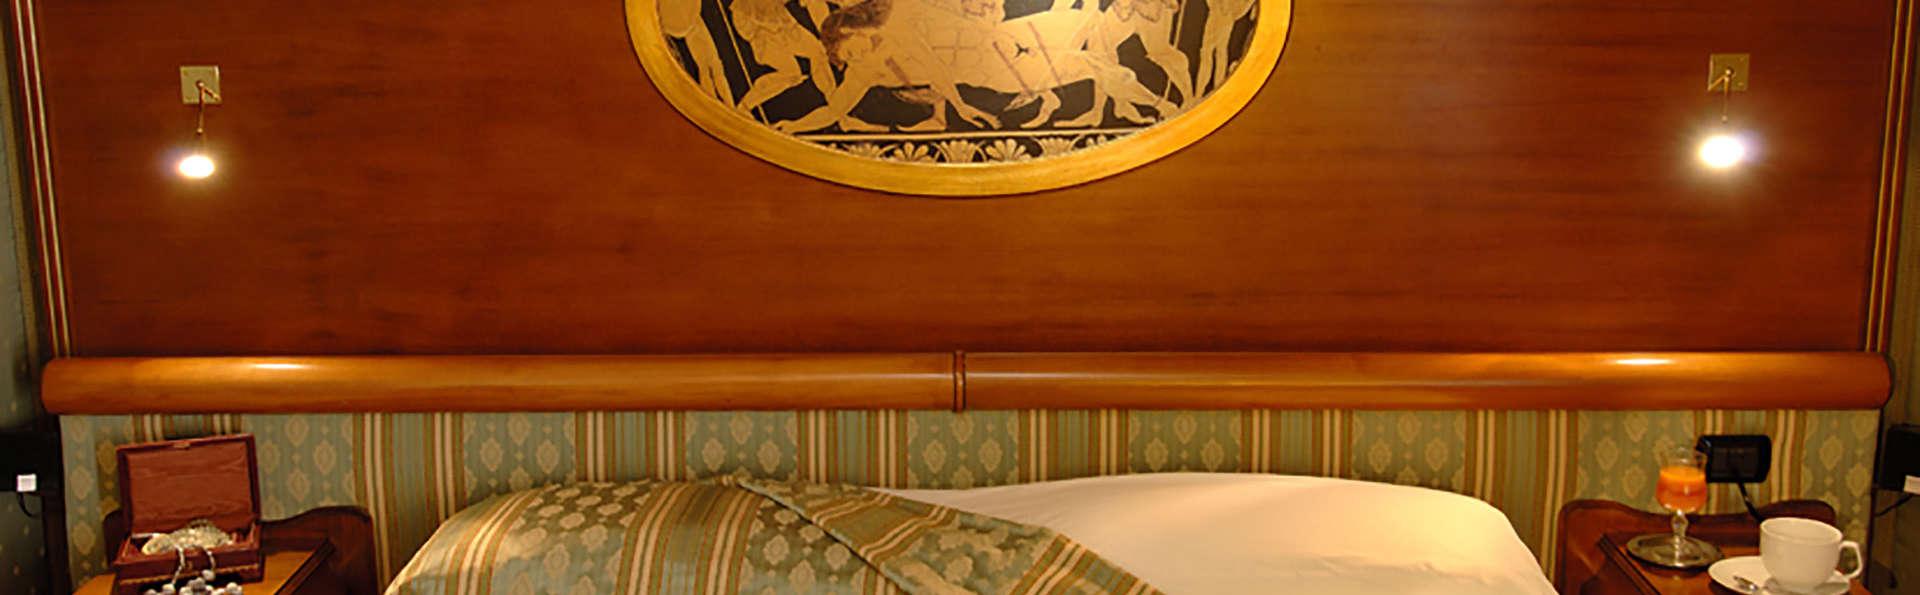 Hotel Royal Catania - EDIT_standard.jpg